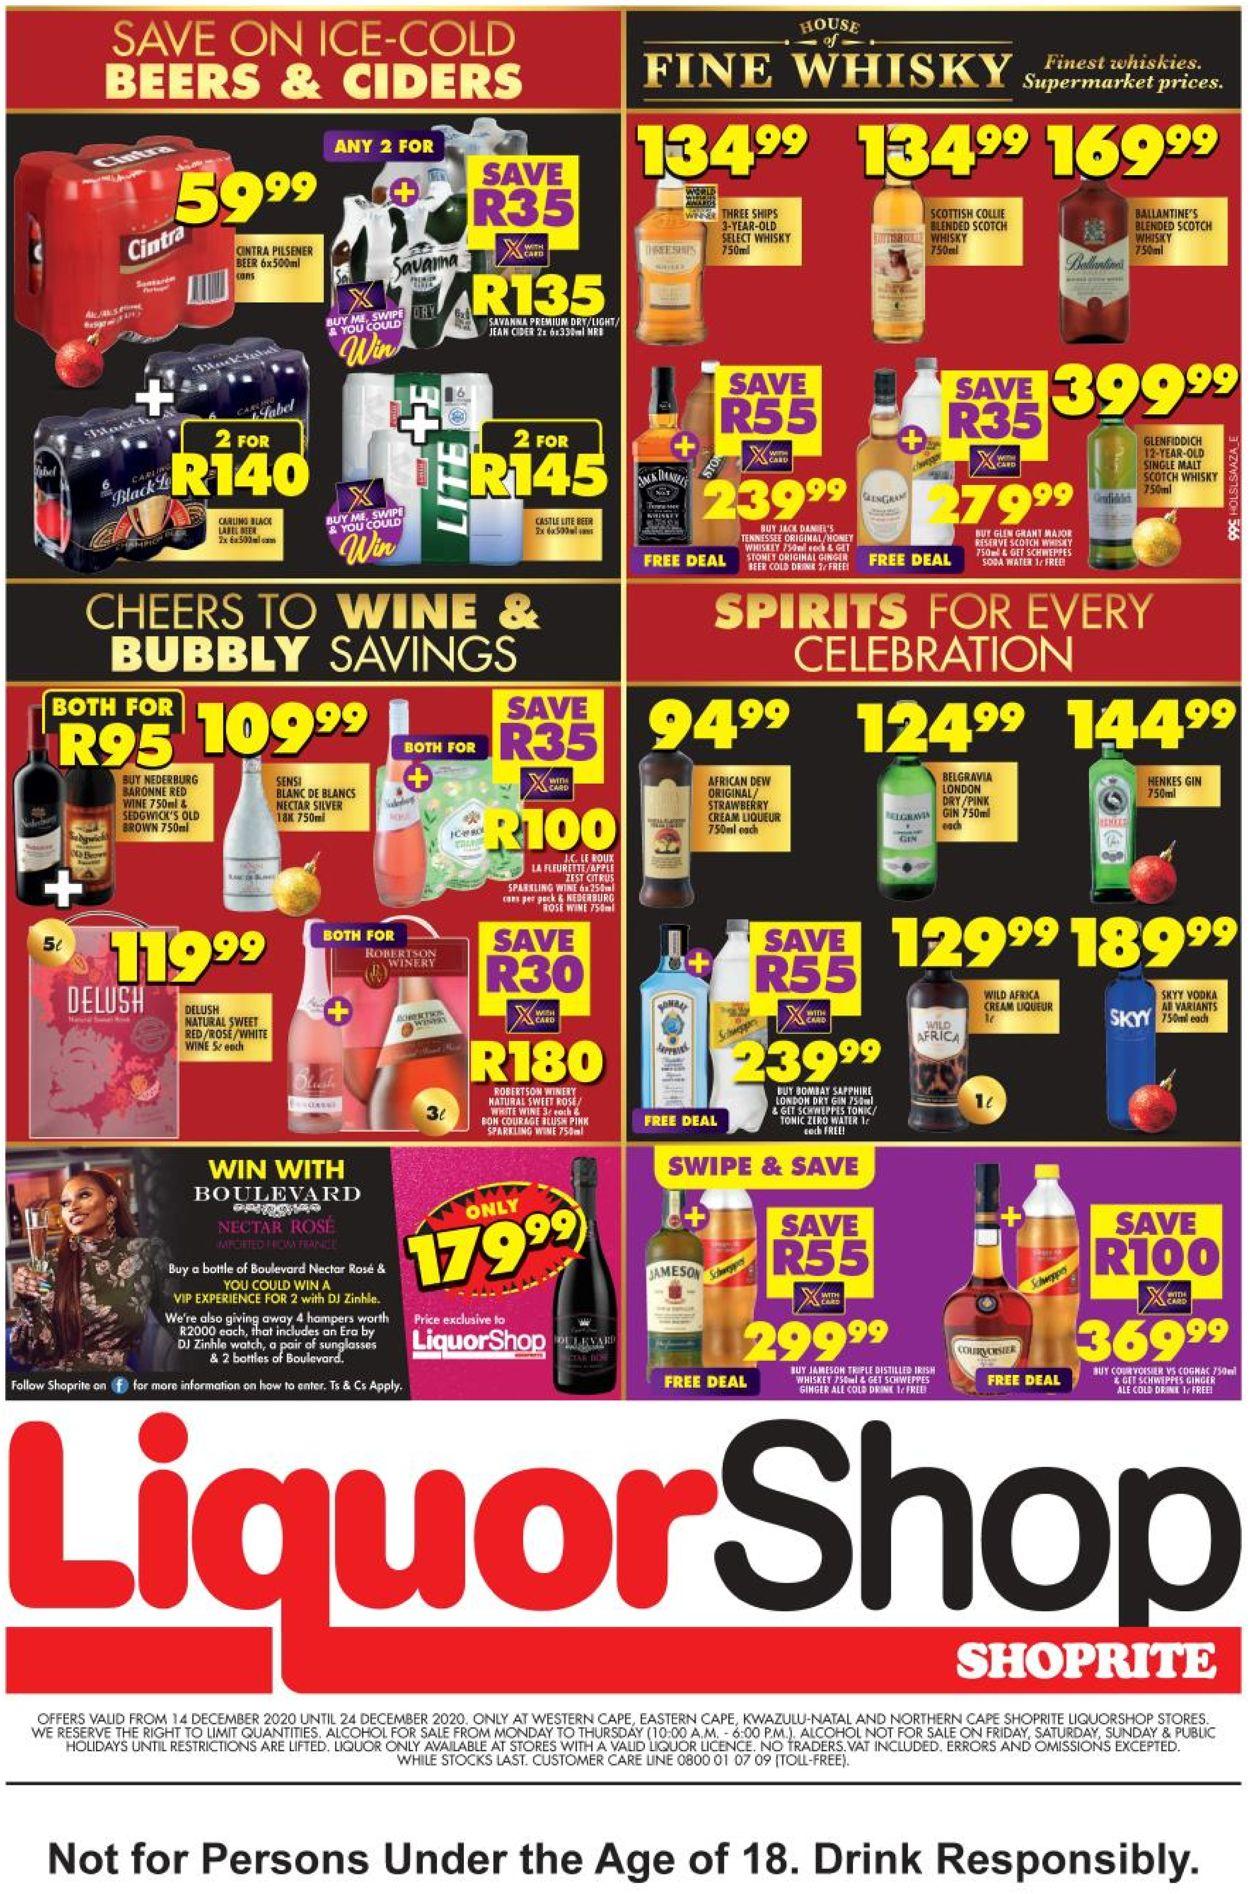 Shoprite LiquorShop Catalogue - 2020/12/14-2020/12/24 (Page 2)